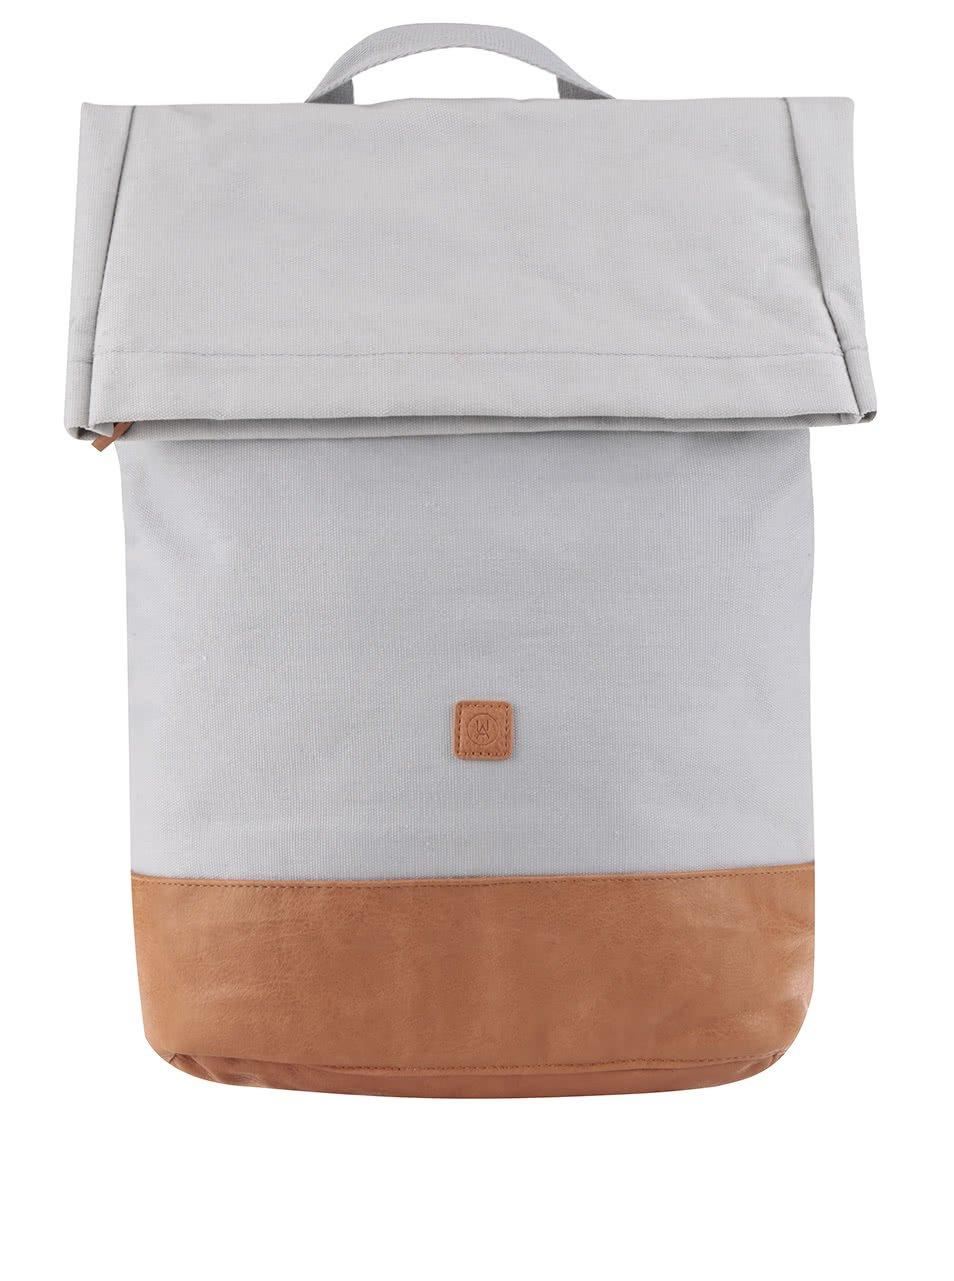 Hnedo-sivý batoh Ucon Karim Waterproof 20 l